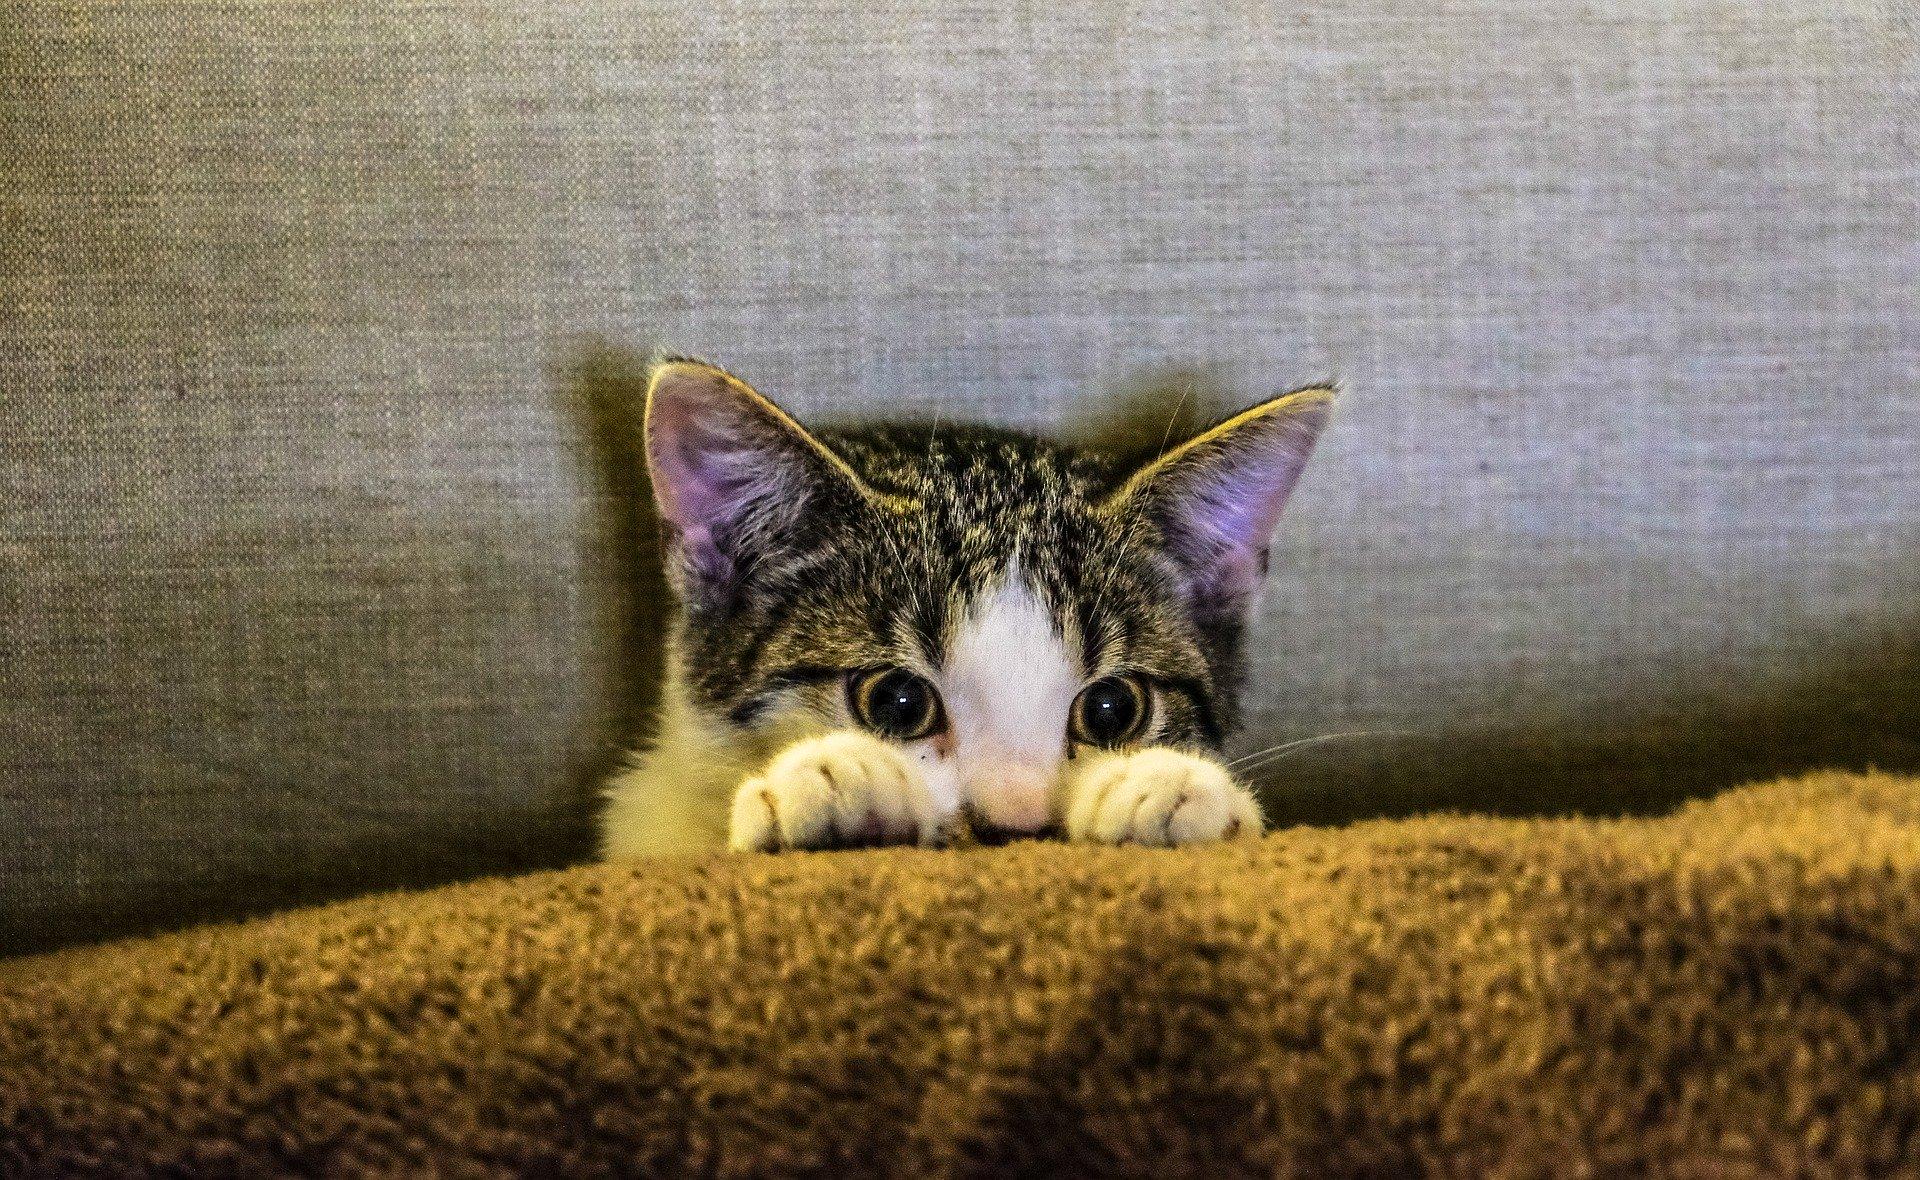 Kleines Kätzchen guckt erschreckt